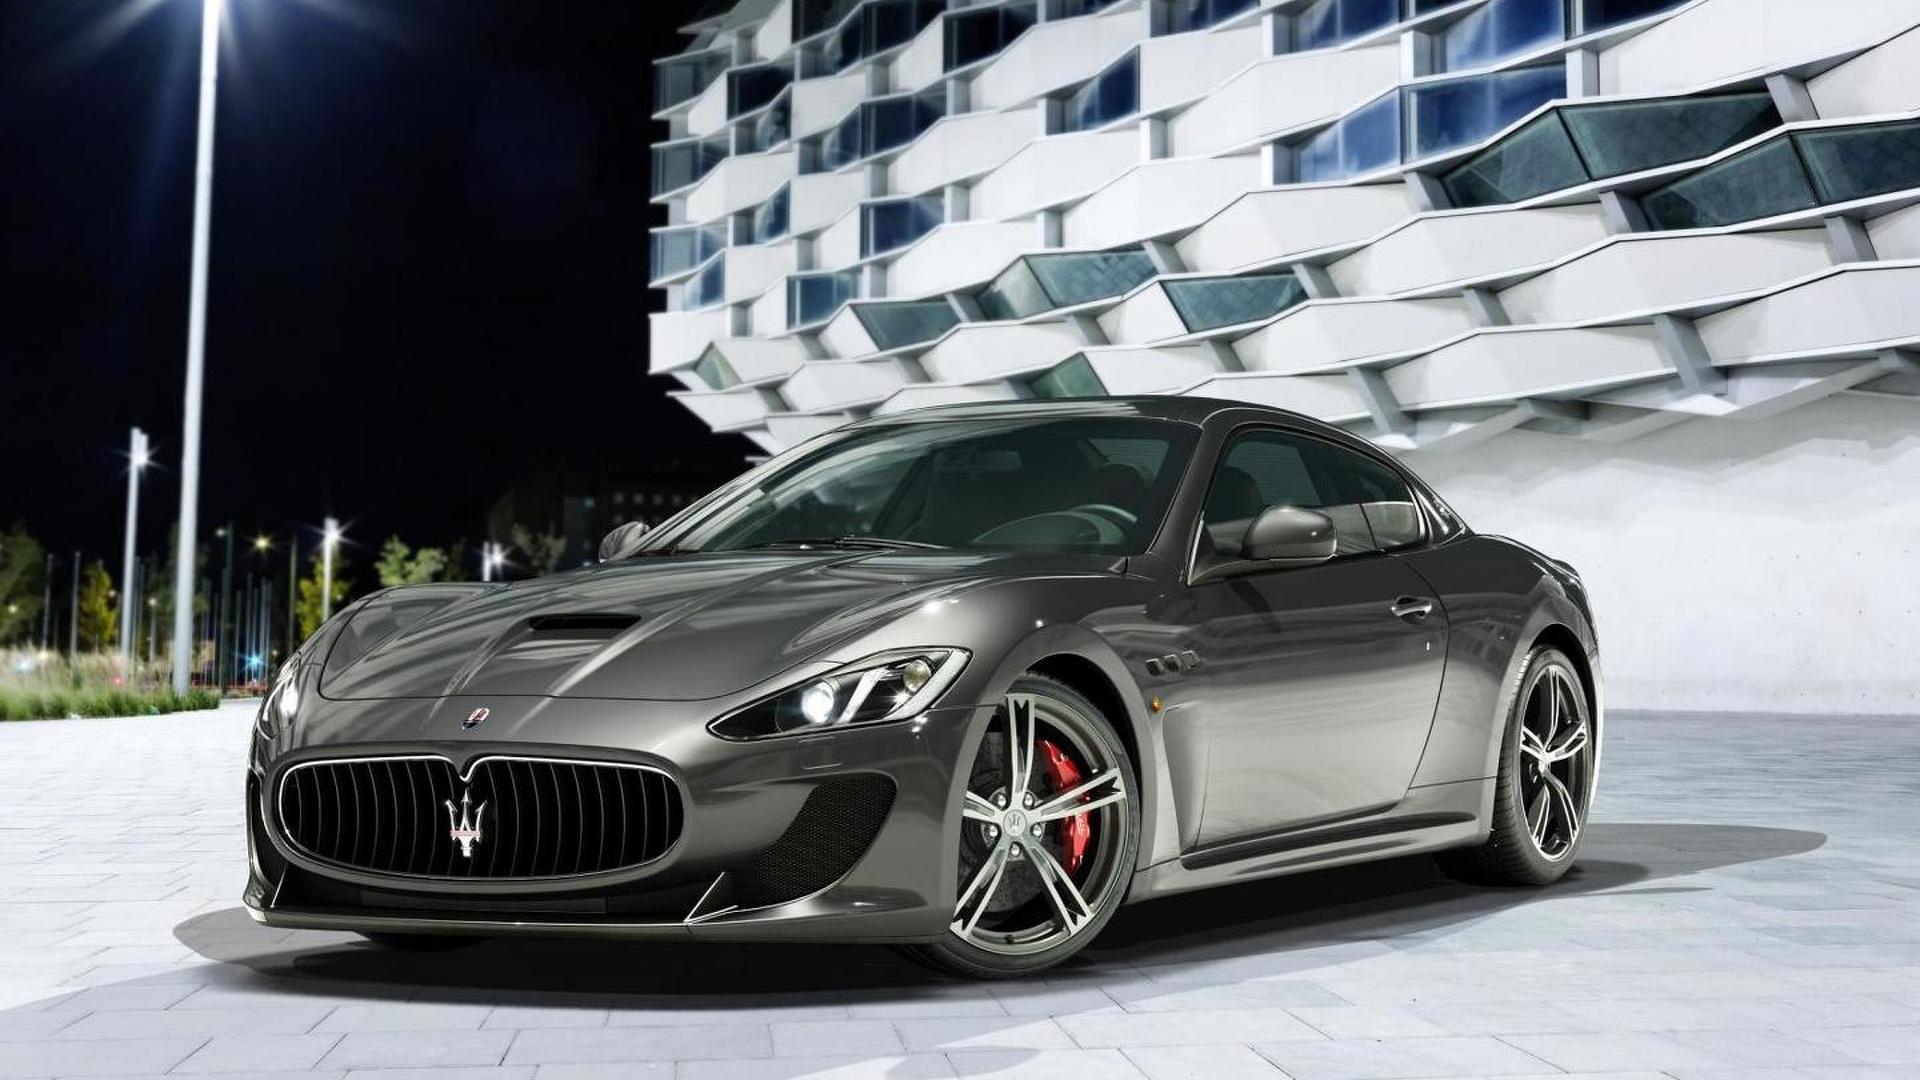 2018 Maserati GranTurismo will be a RWD coupe with \